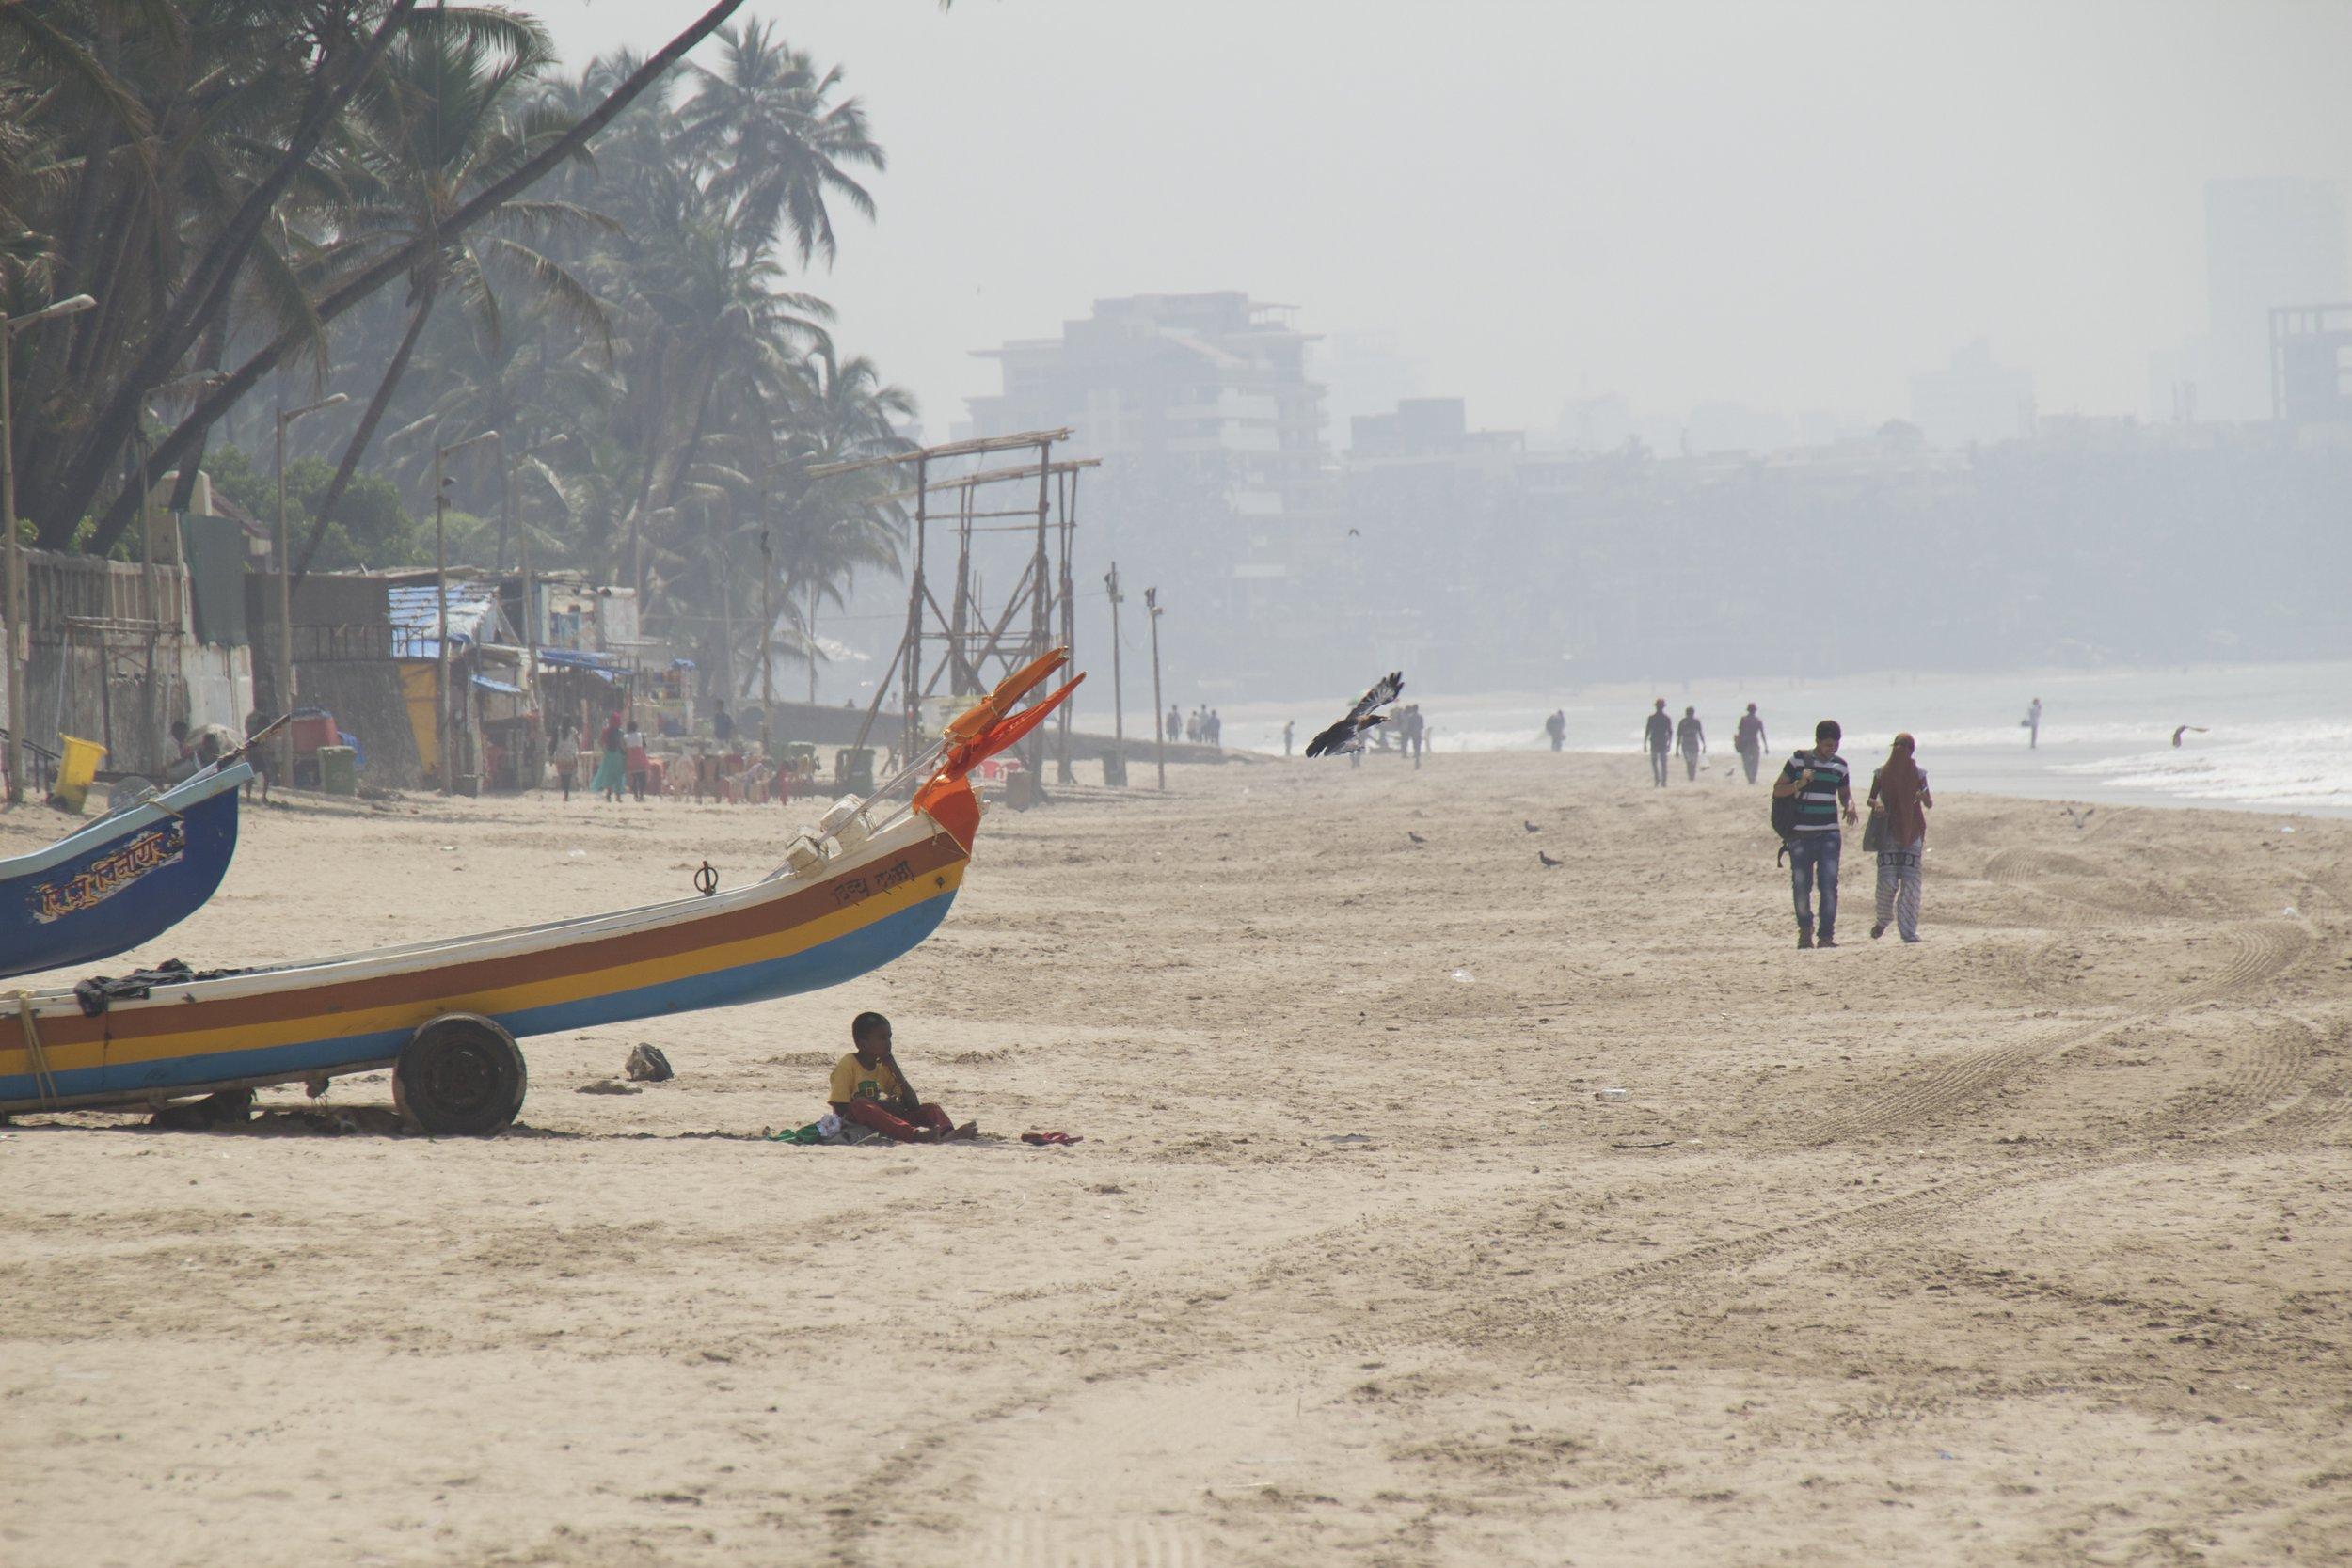 juhu beach mumbai bombay india photography 8.jpg